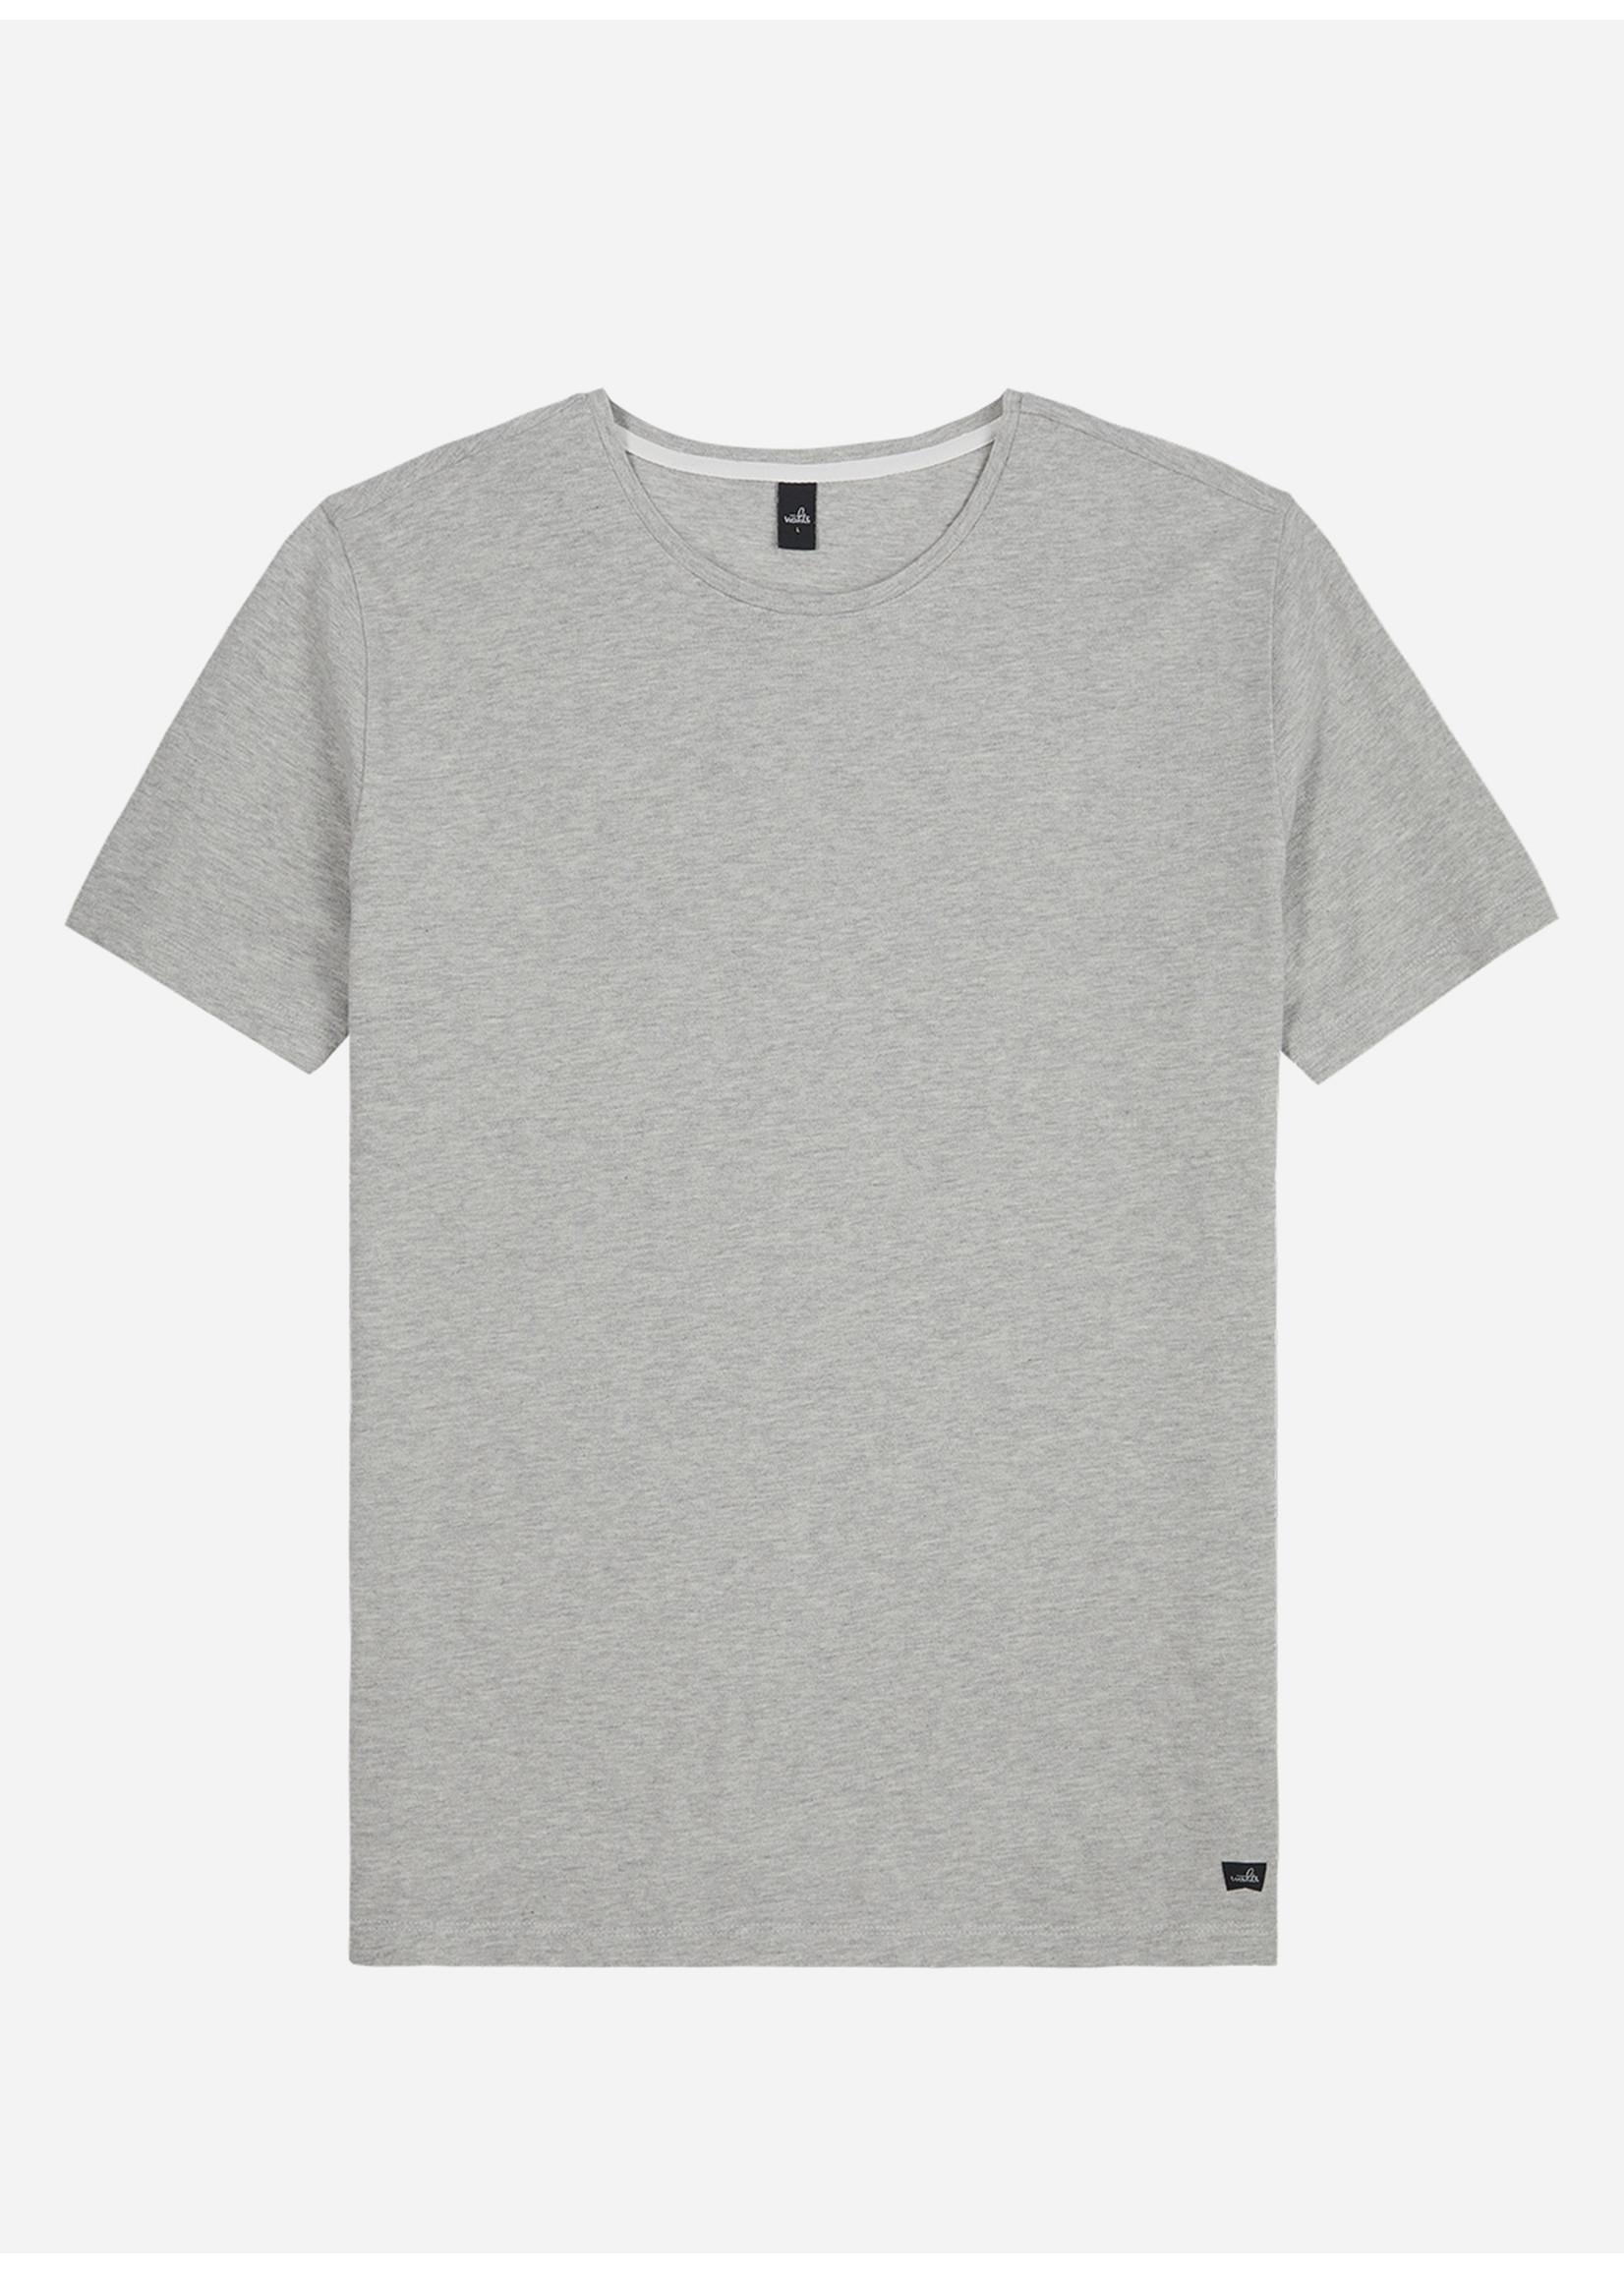 Wahts Dean piqué crew neck t-shirt light grey